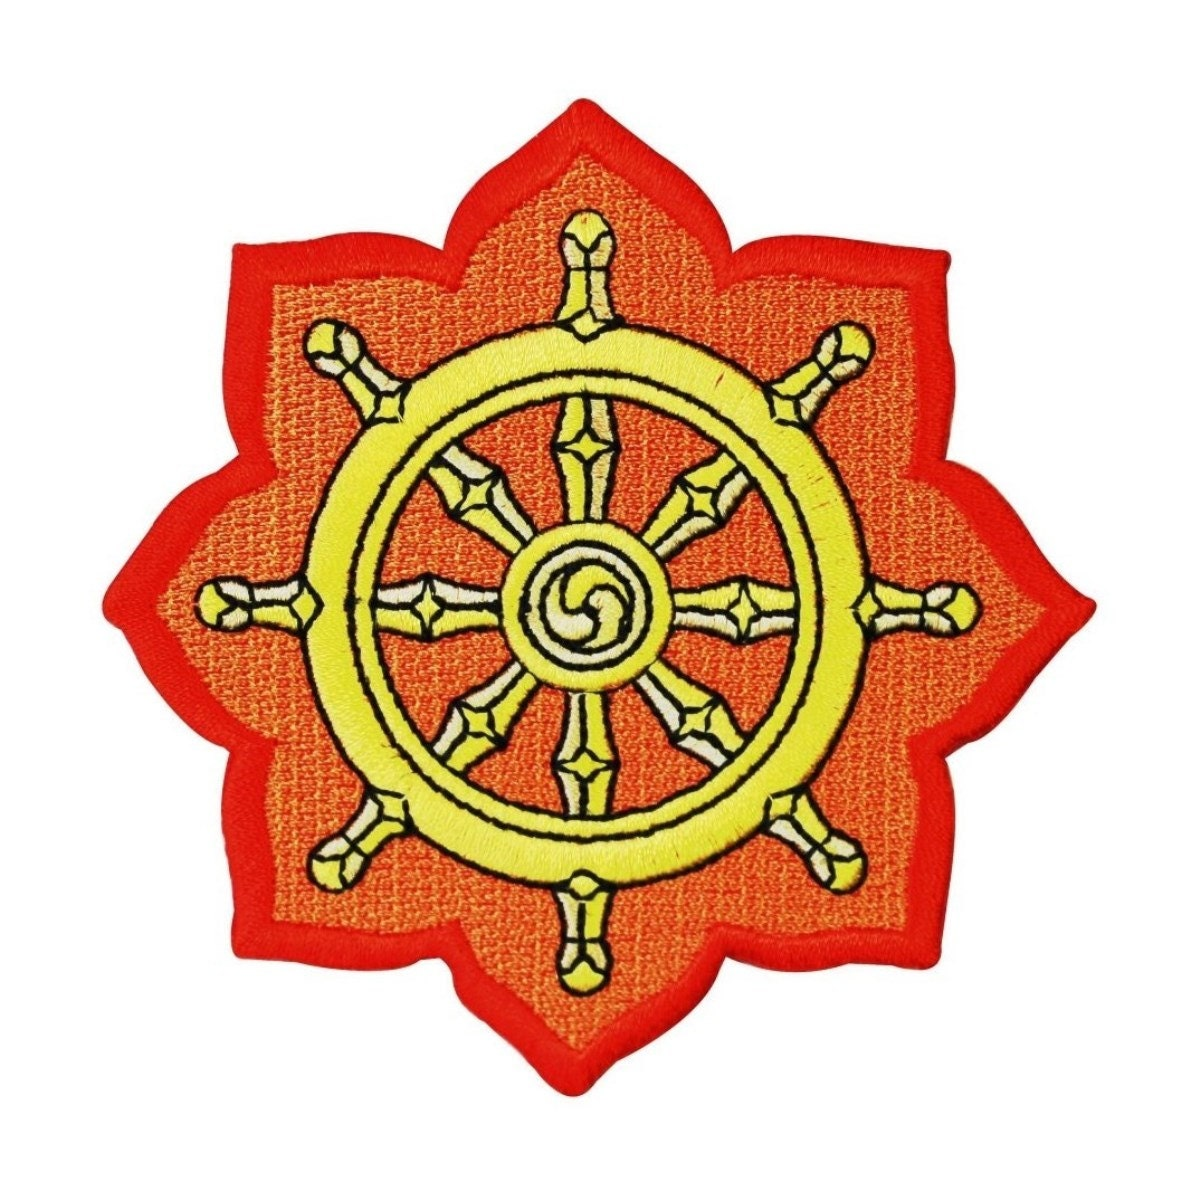 Dharmachakra dharma wheel patch buddhist symbol art decoration zoom buycottarizona Image collections